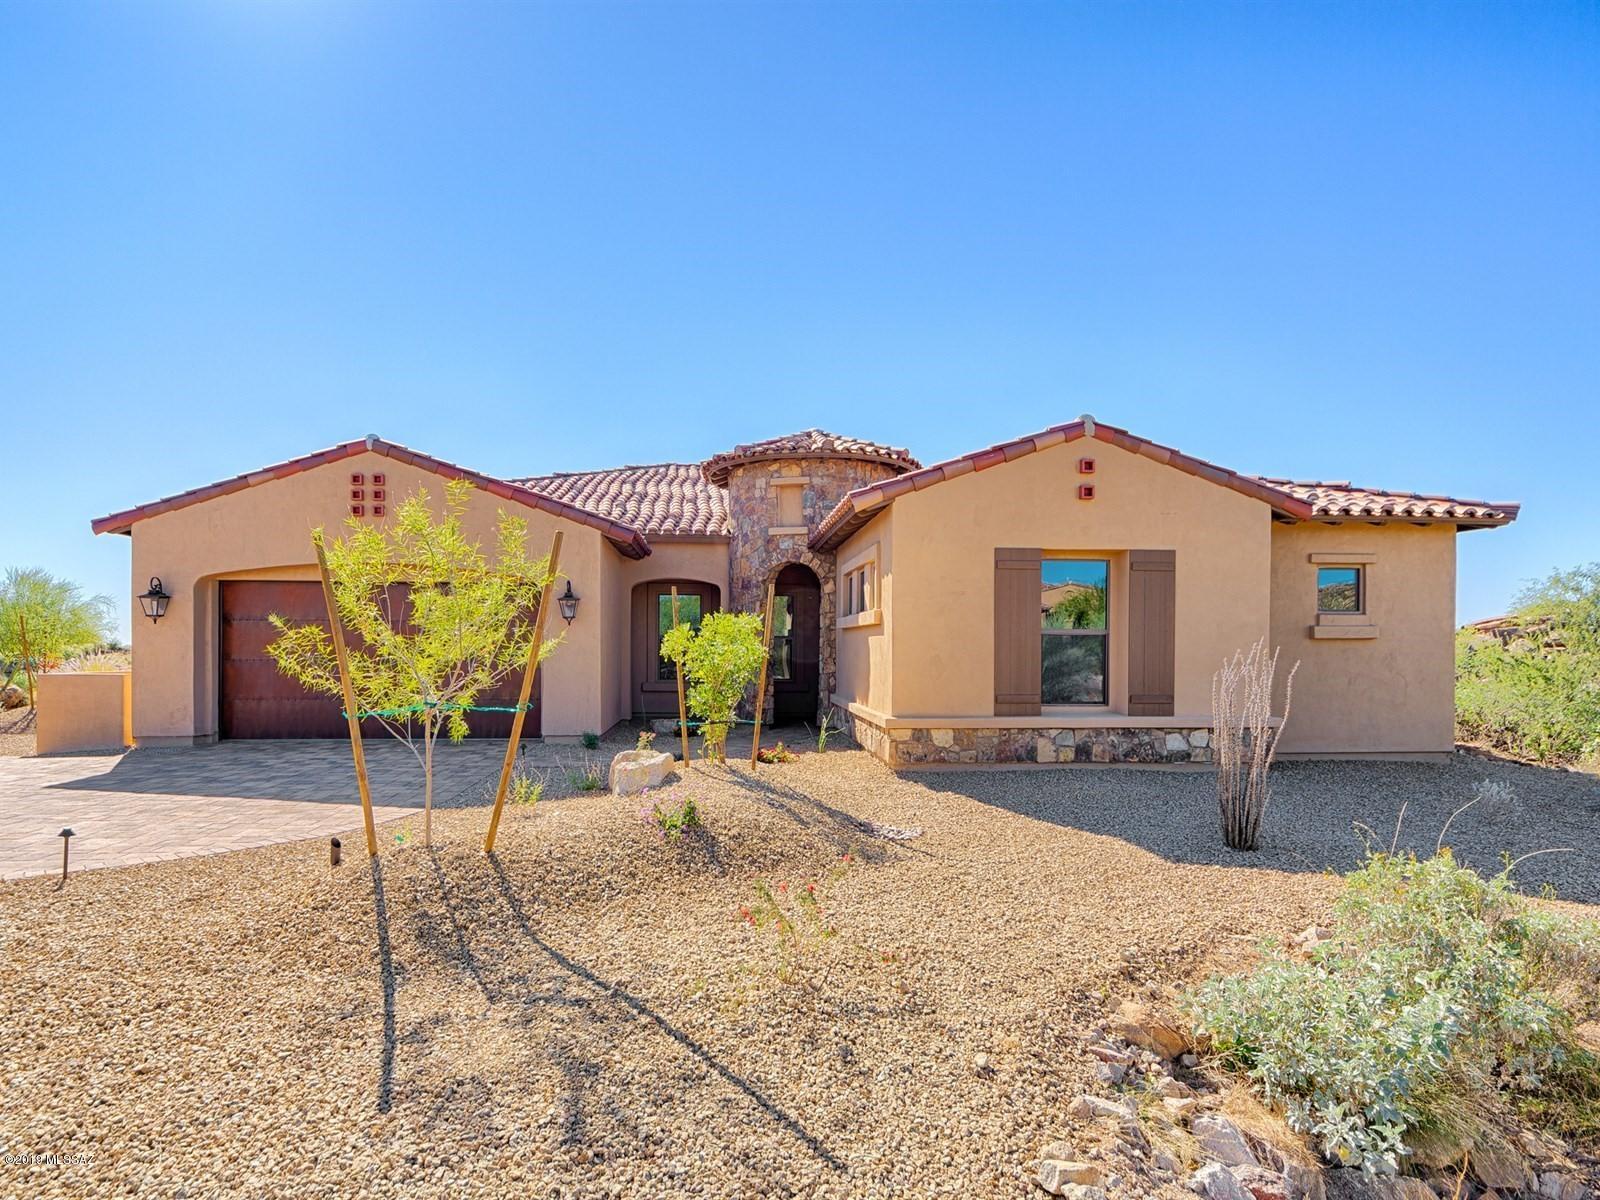 Photo of 465 W Echo Point Place, Oro Valley, AZ 85755